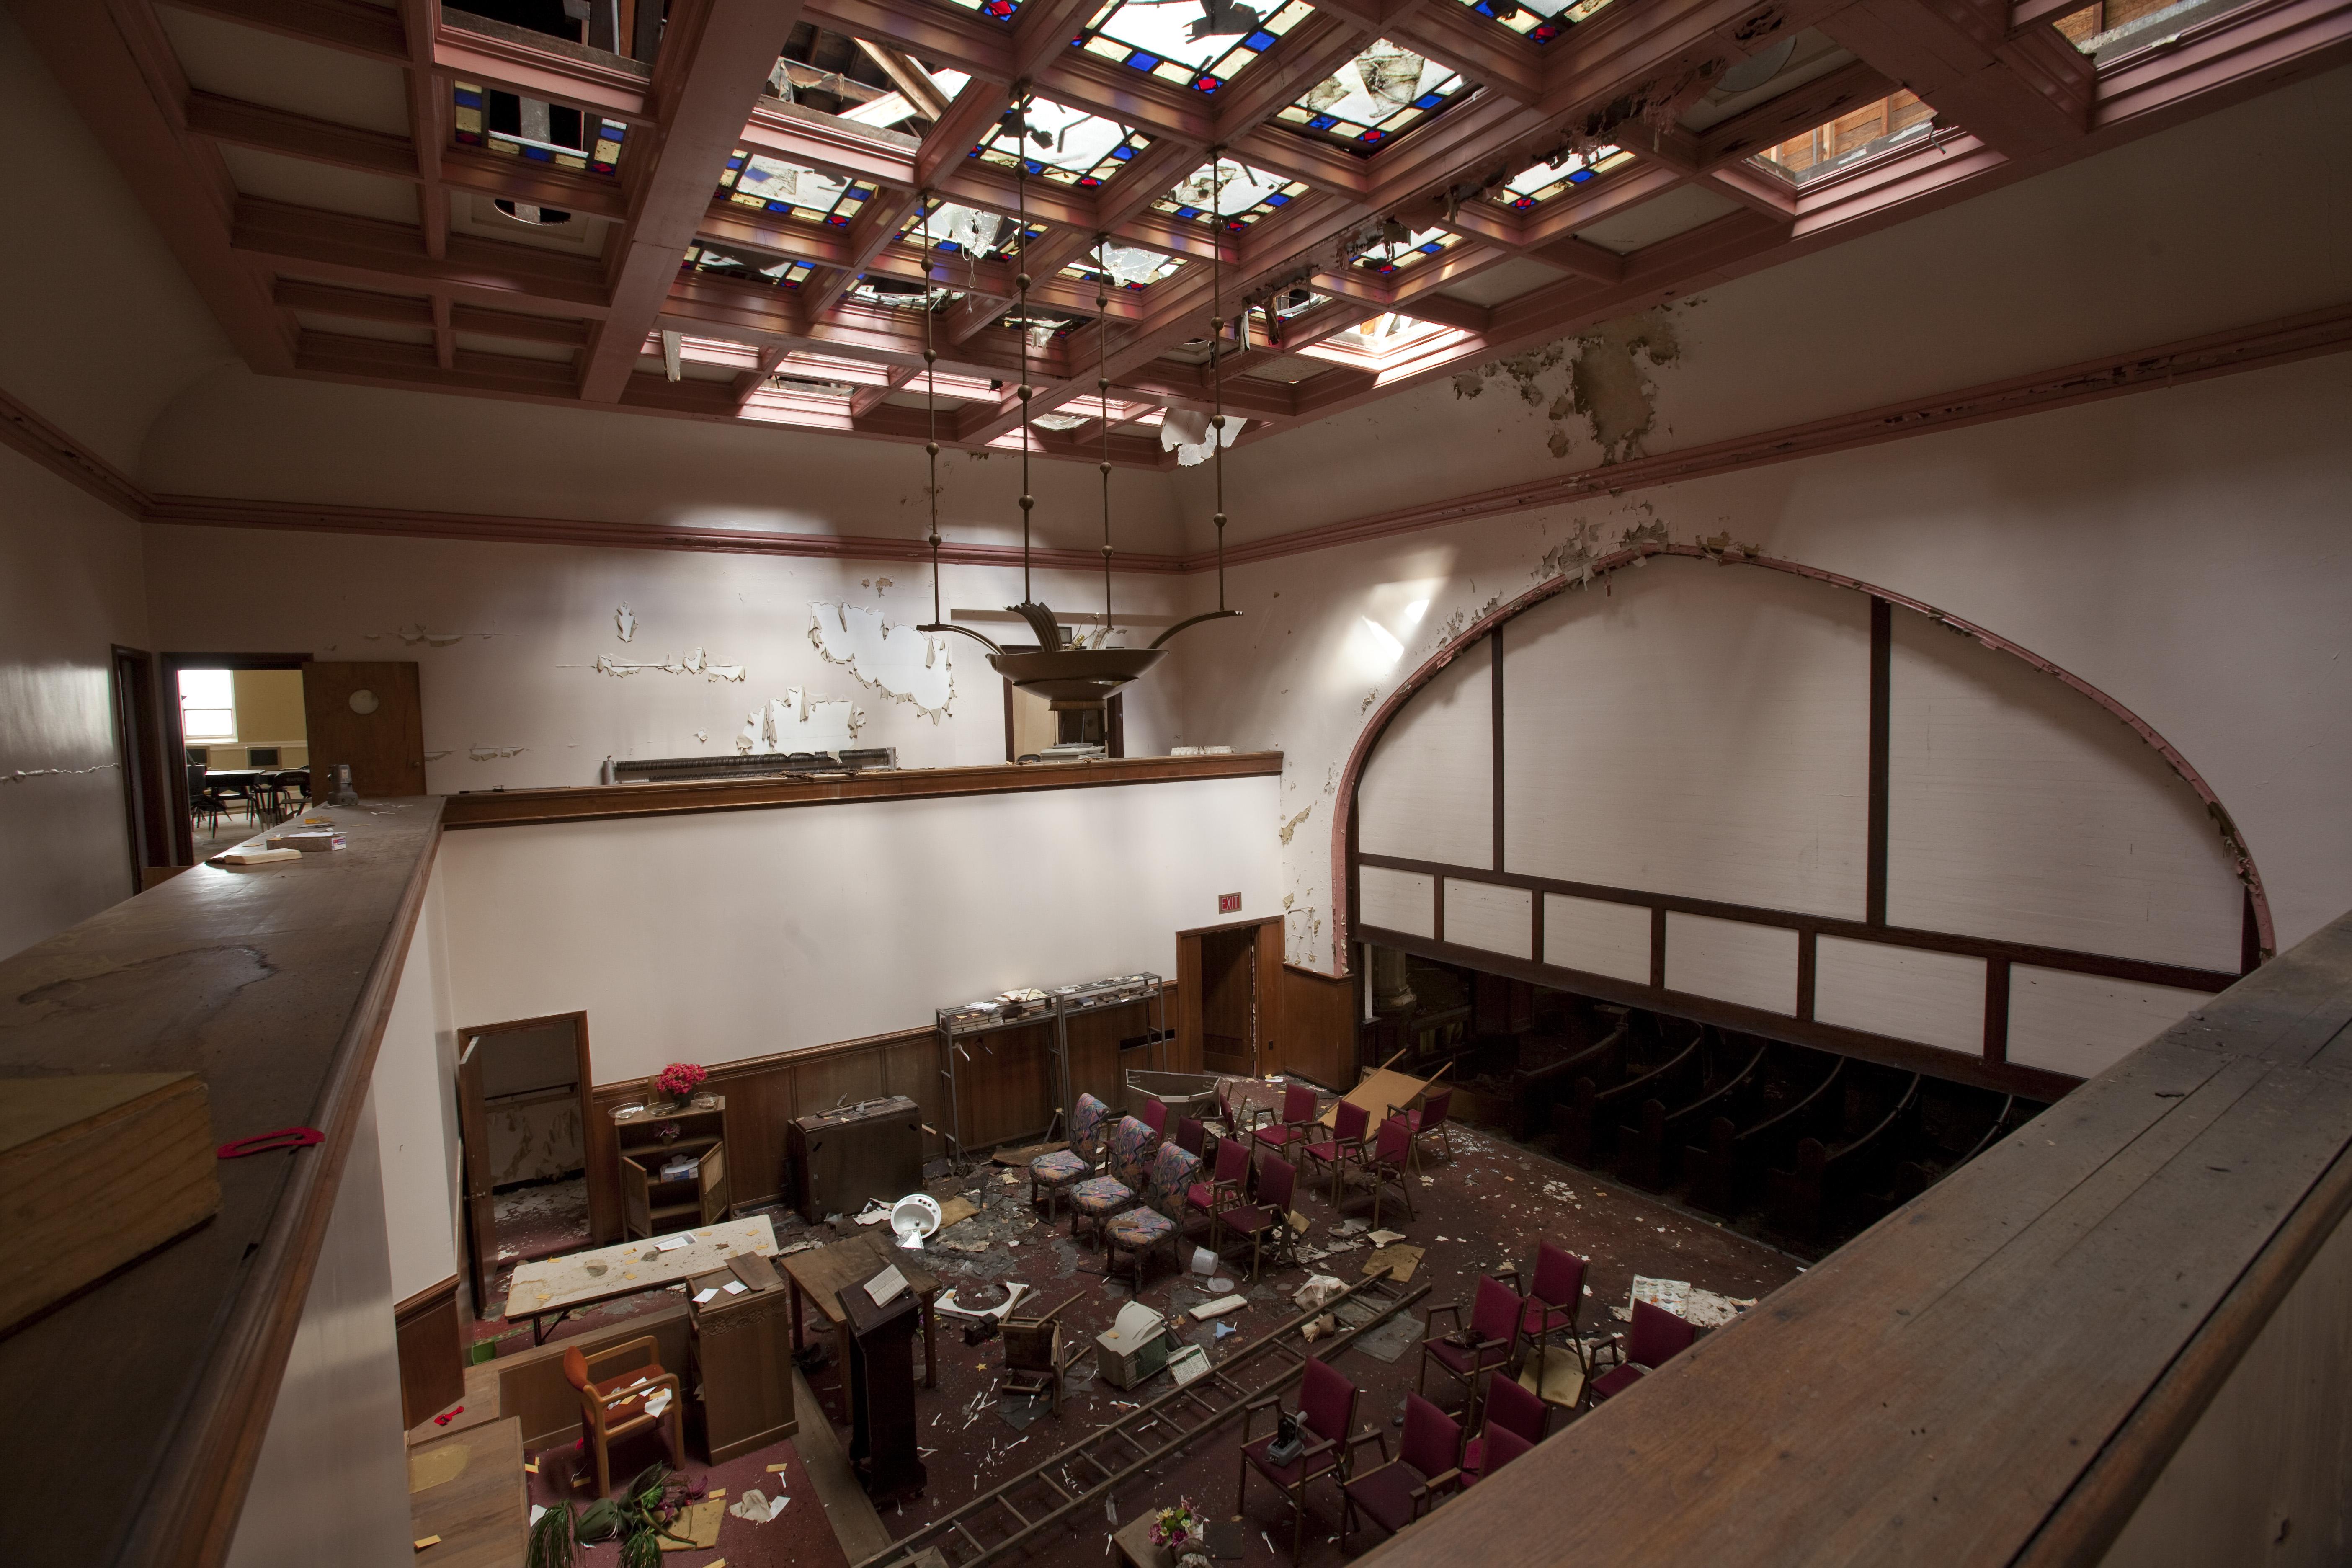 File:Woodward Avenue Presbyterian Church auxiliary